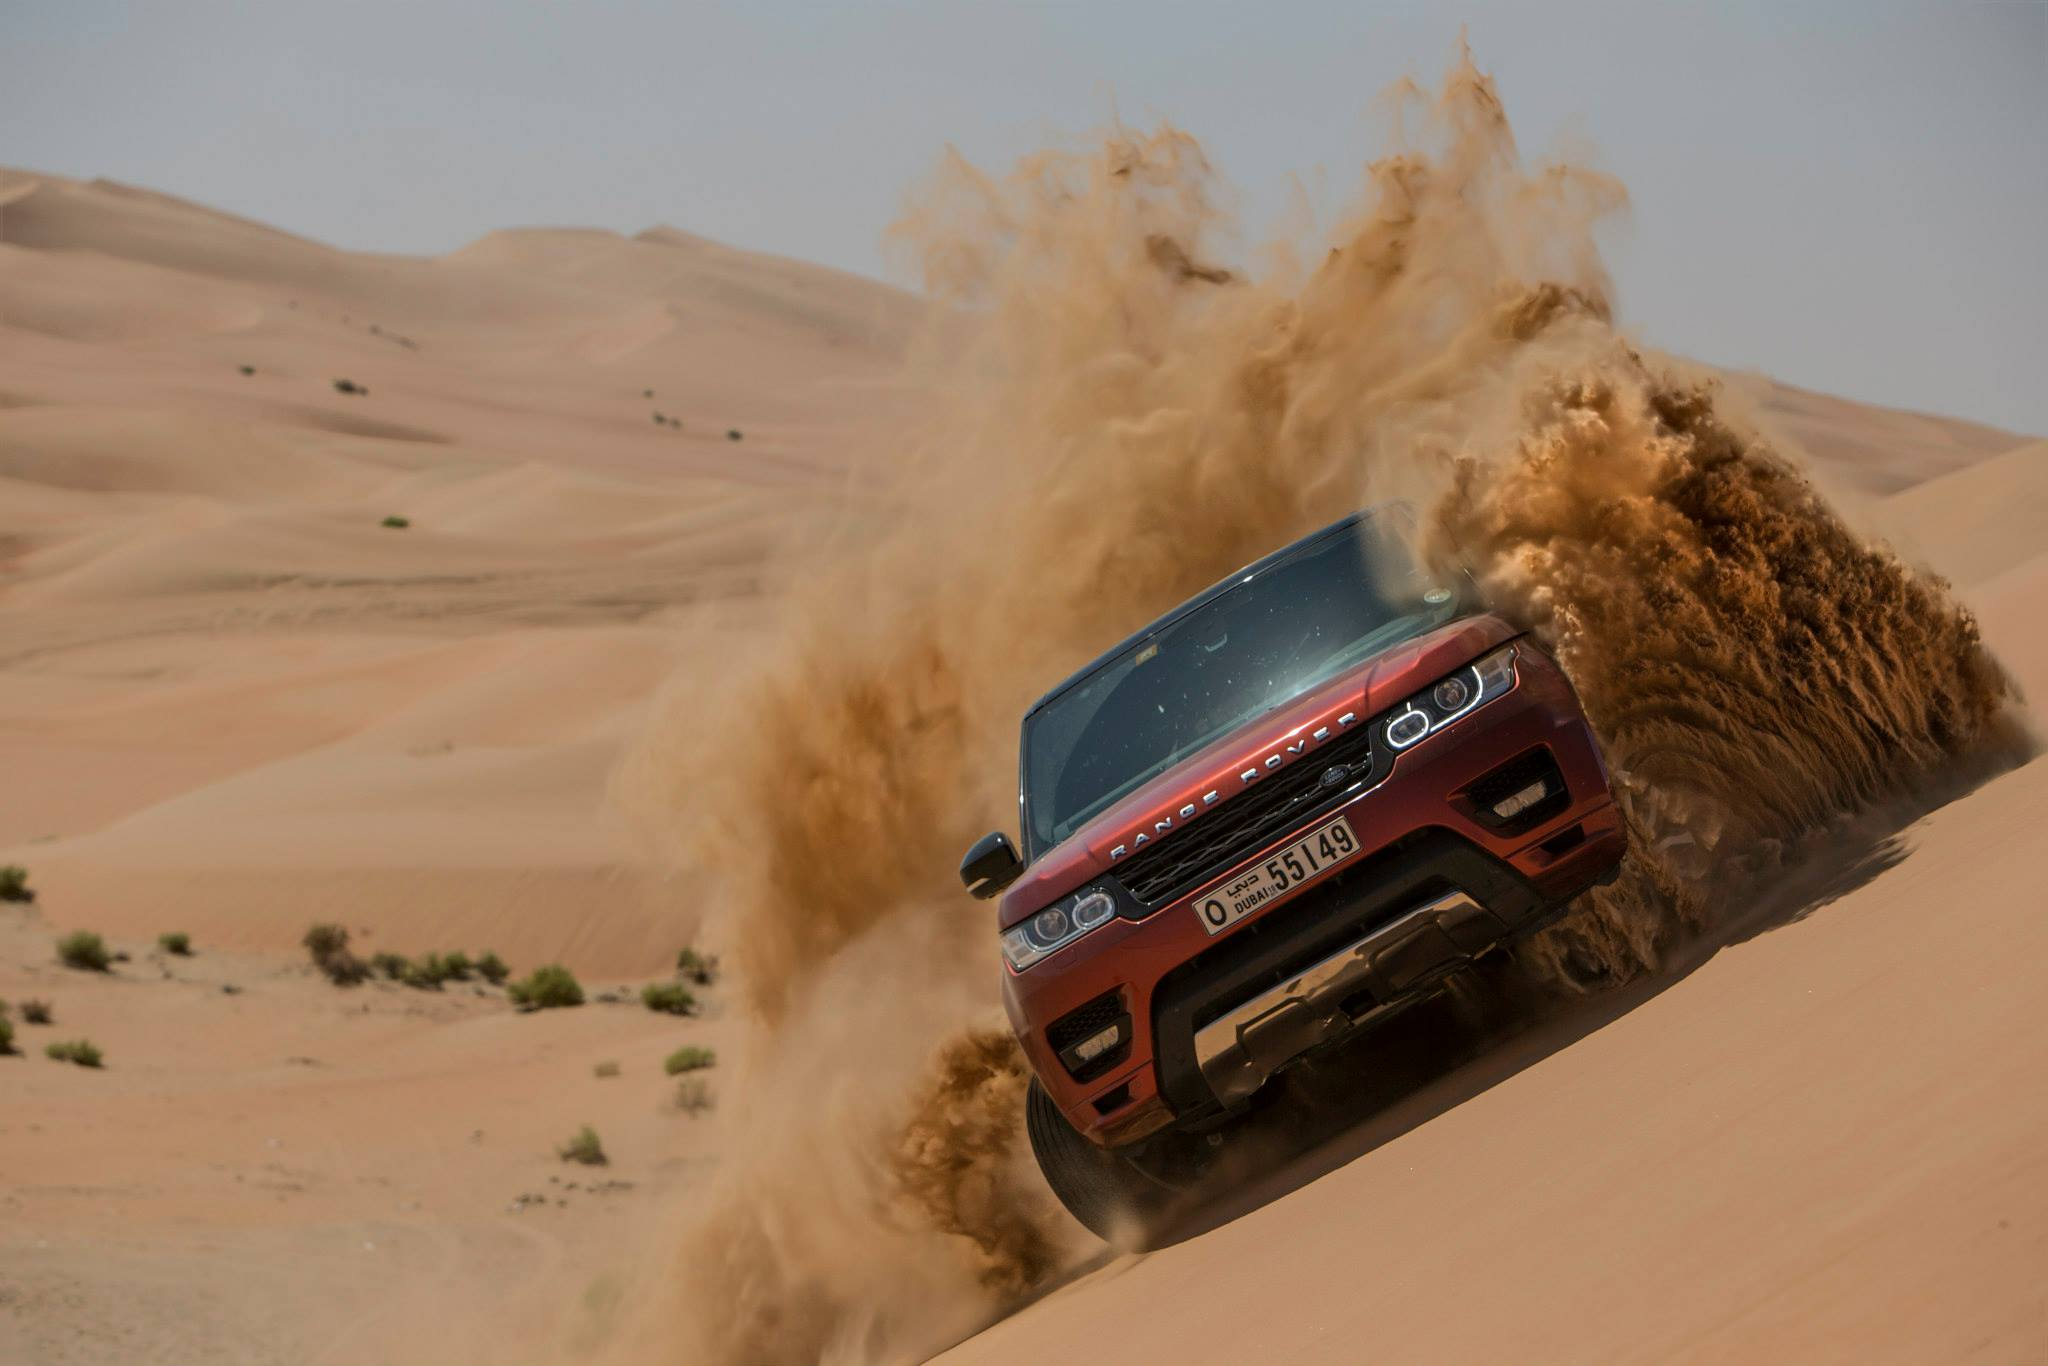 2013 Jeep Grand Cherokee For Sale >> Video: New Range Rover Sport Takes on the World's Largest Sand Desert! - GTspirit